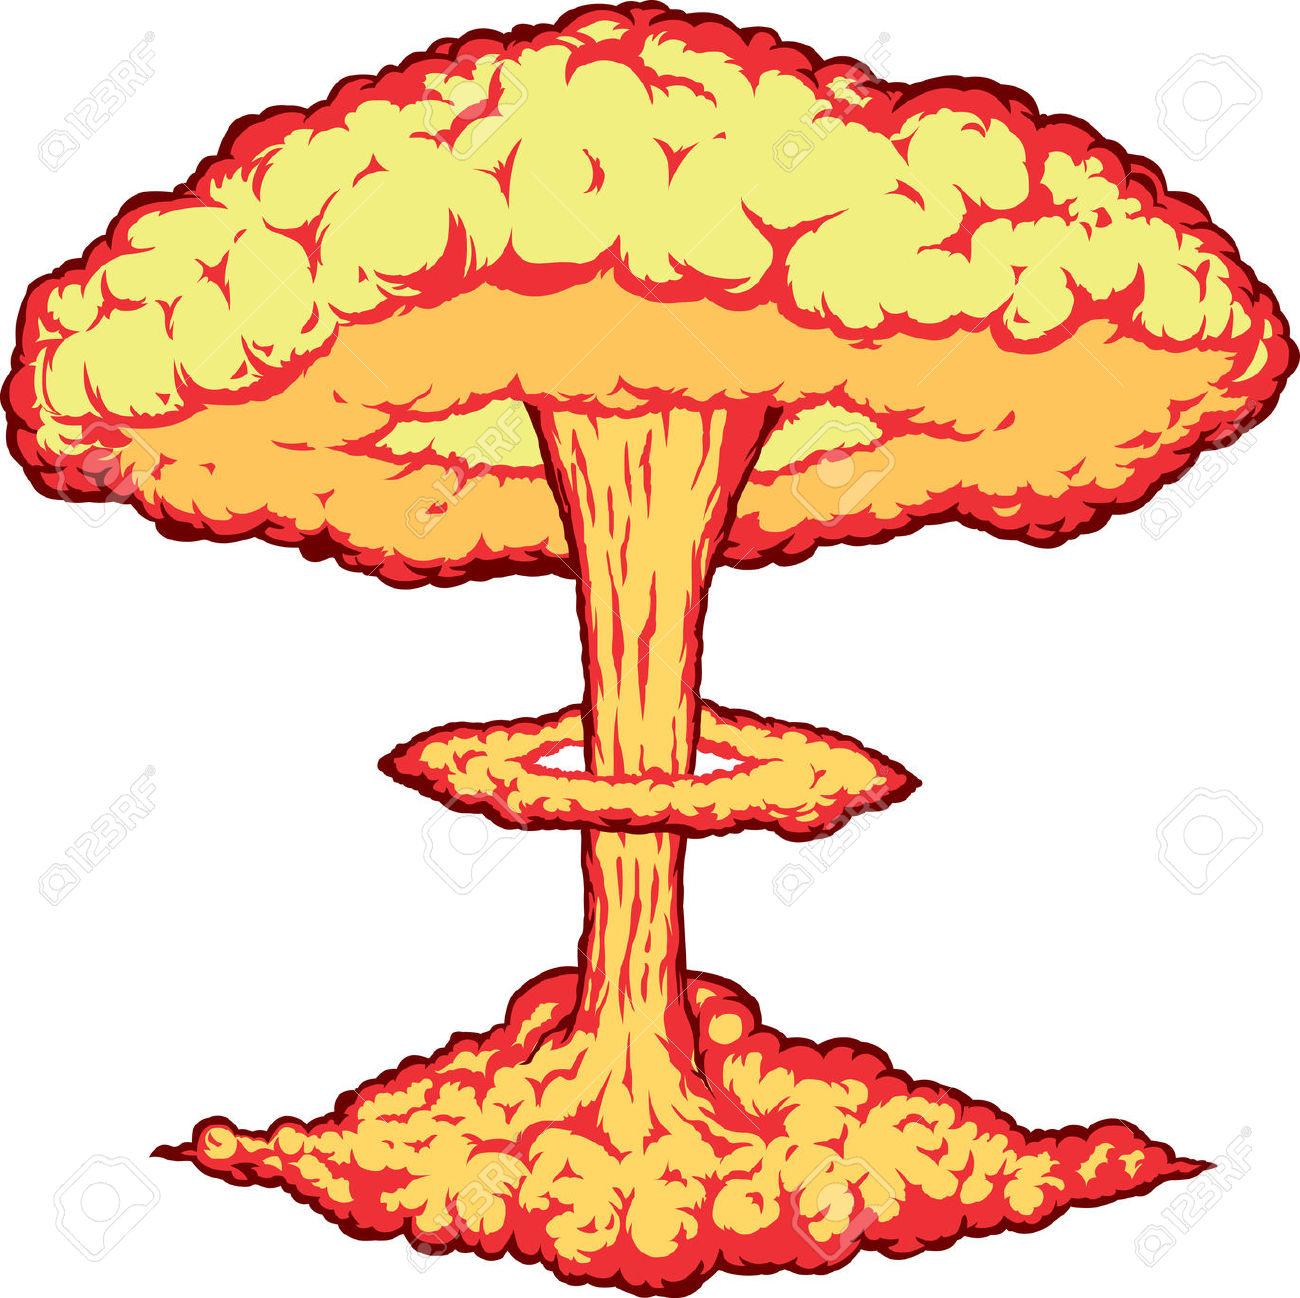 Nuclear Explosion Clipart-Nuclear Explosion Clipart-17